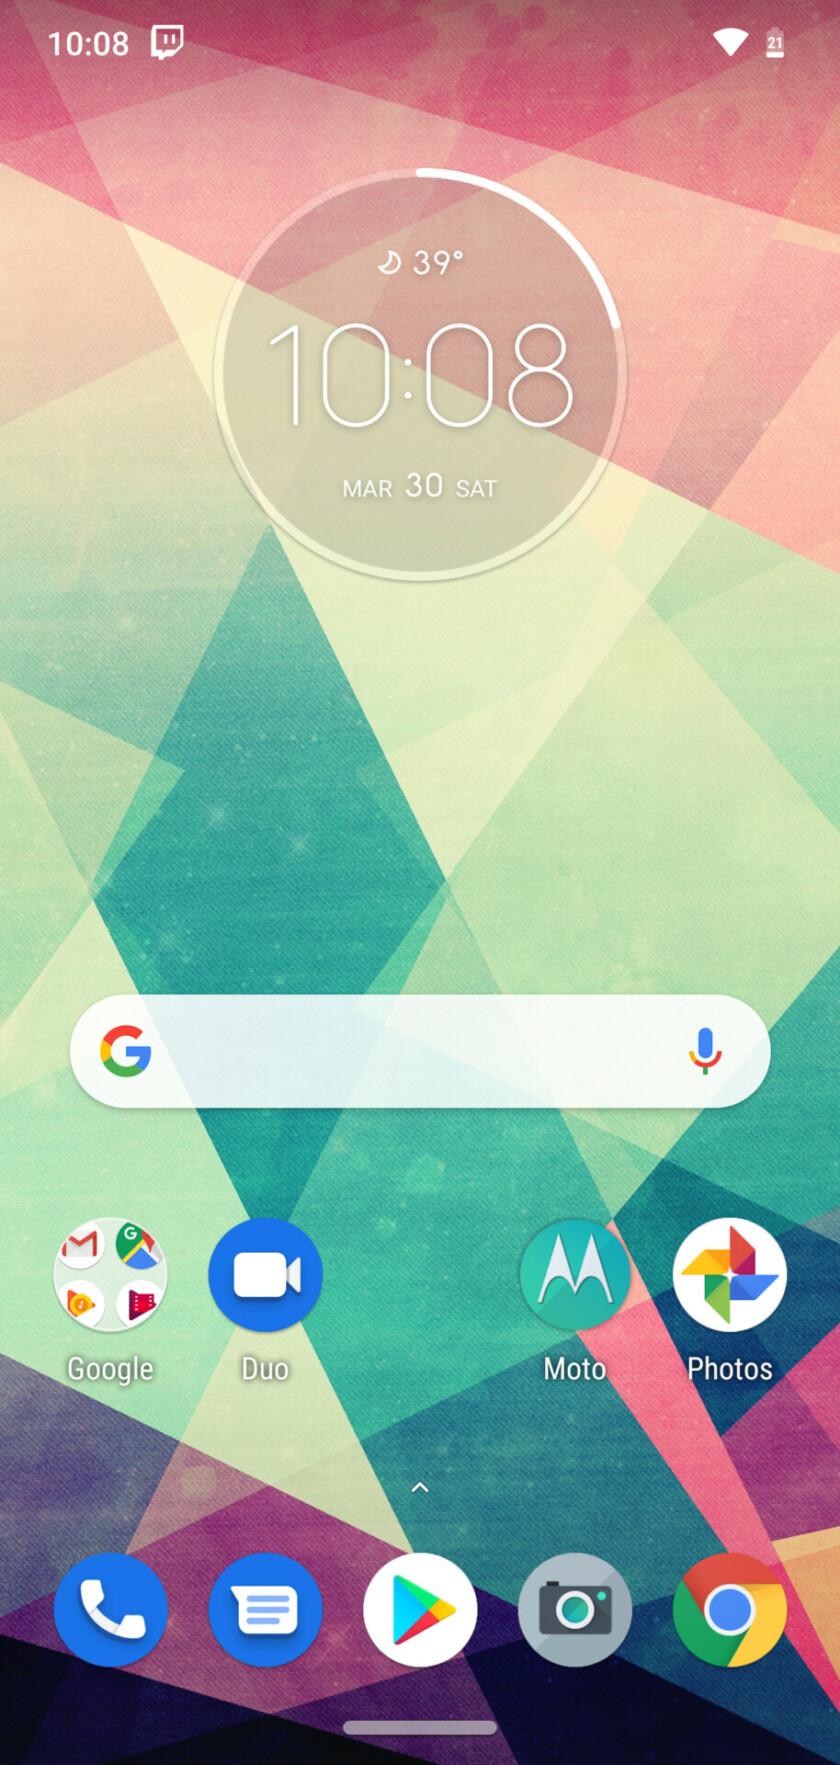 Moto G7 Review software UI screenshots